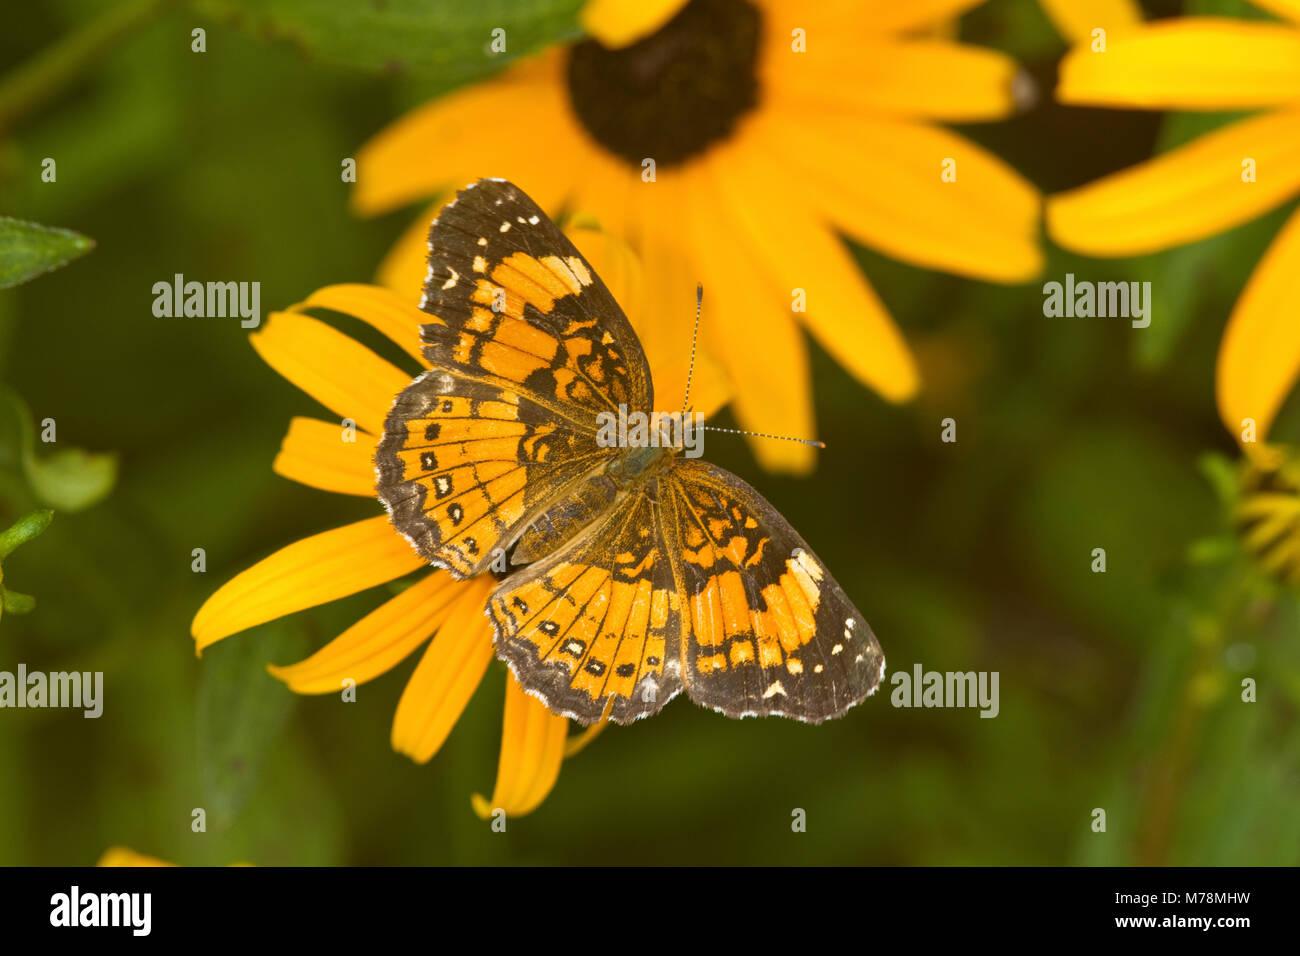 Plateado 03365-00302 Checkerspot butterfly (Chlosyne nycteis) Goldstrum Black-eyed Susans (Rudbeckia hirta 'Goldstrum') Foto de stock